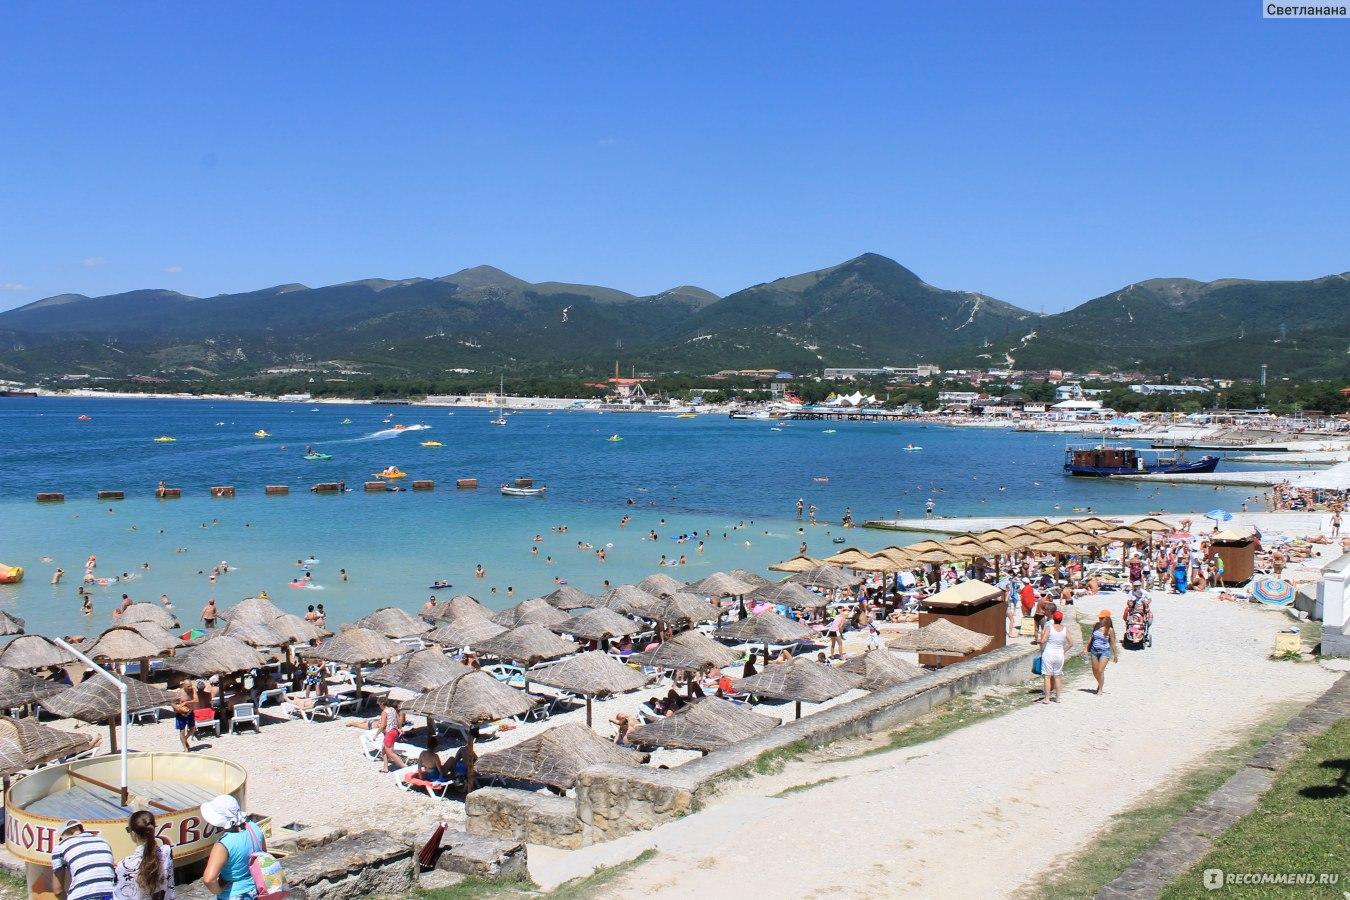 Кабардинка фото города и пляжа 2018